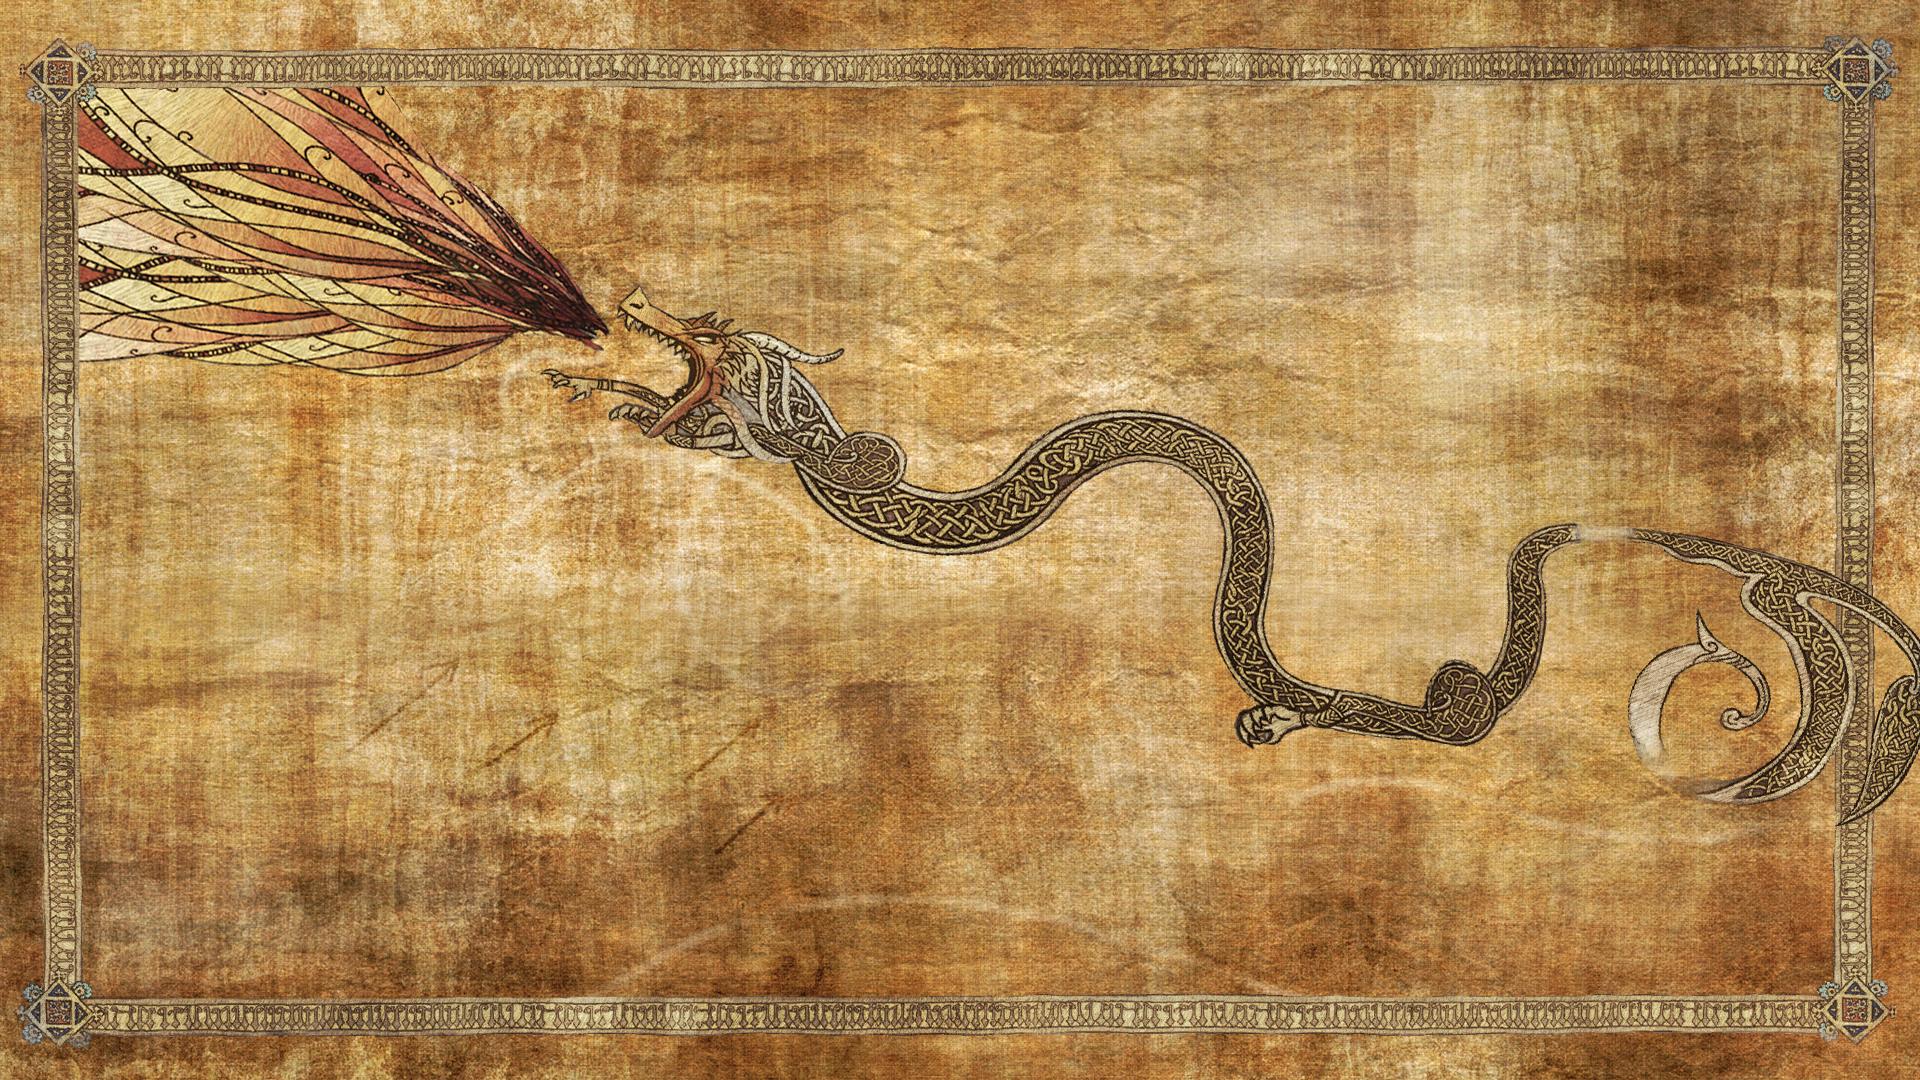 Dragon lore wallpaper wallpapersafari - Dragon Lore Wallpaper